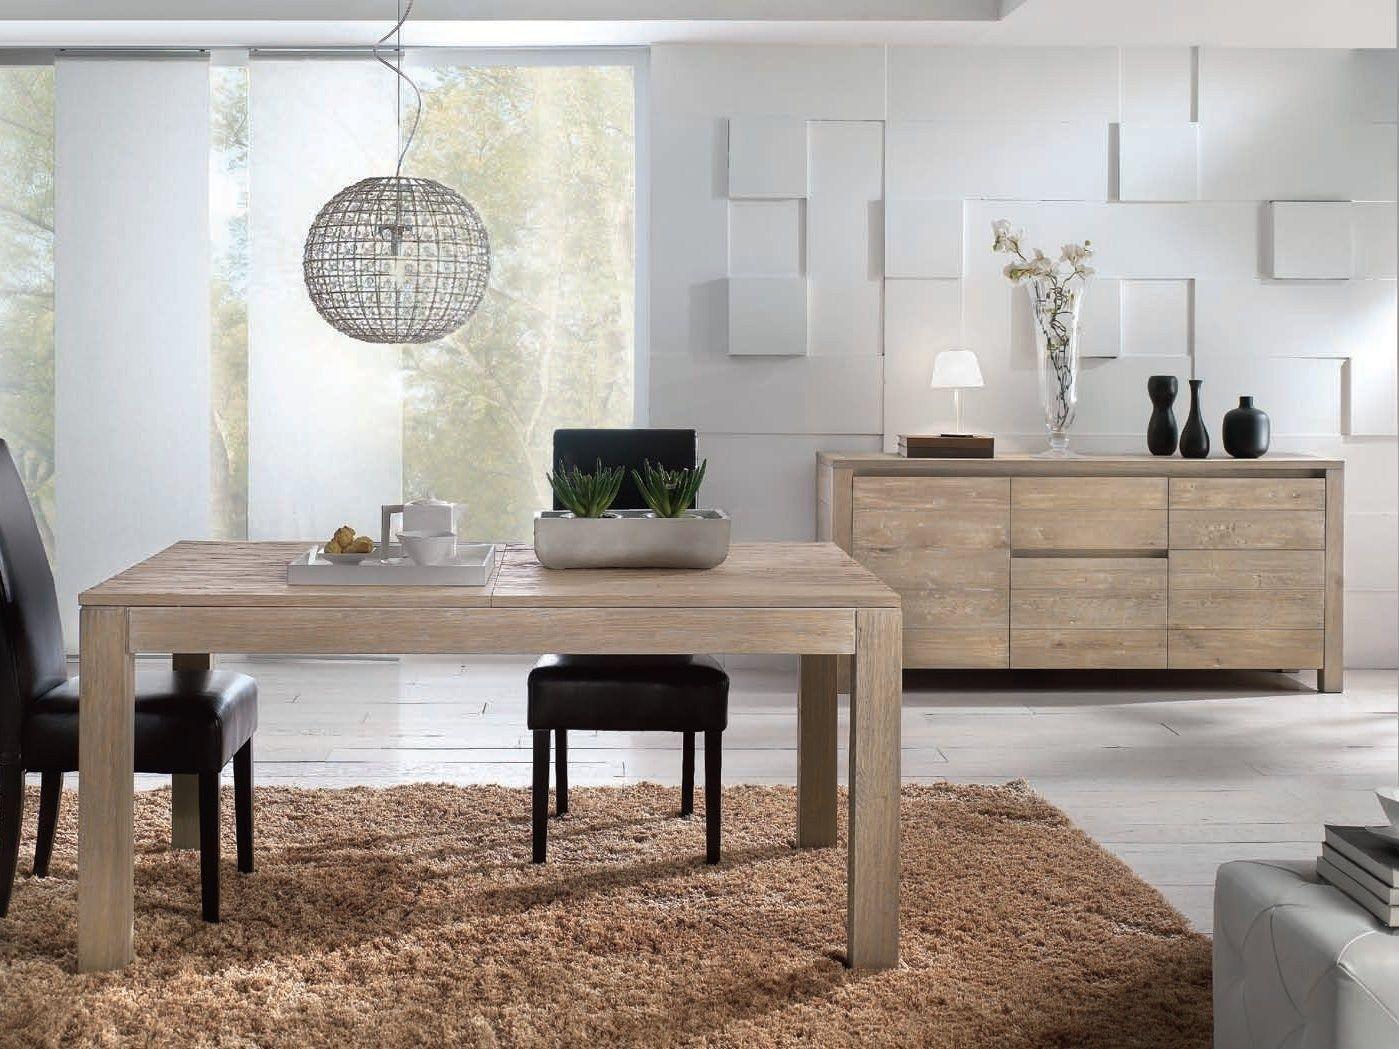 Mobili sala da pranzo cerca con google sala da pranzo dining dining table e furniture - Mobili sala da pranzo ...